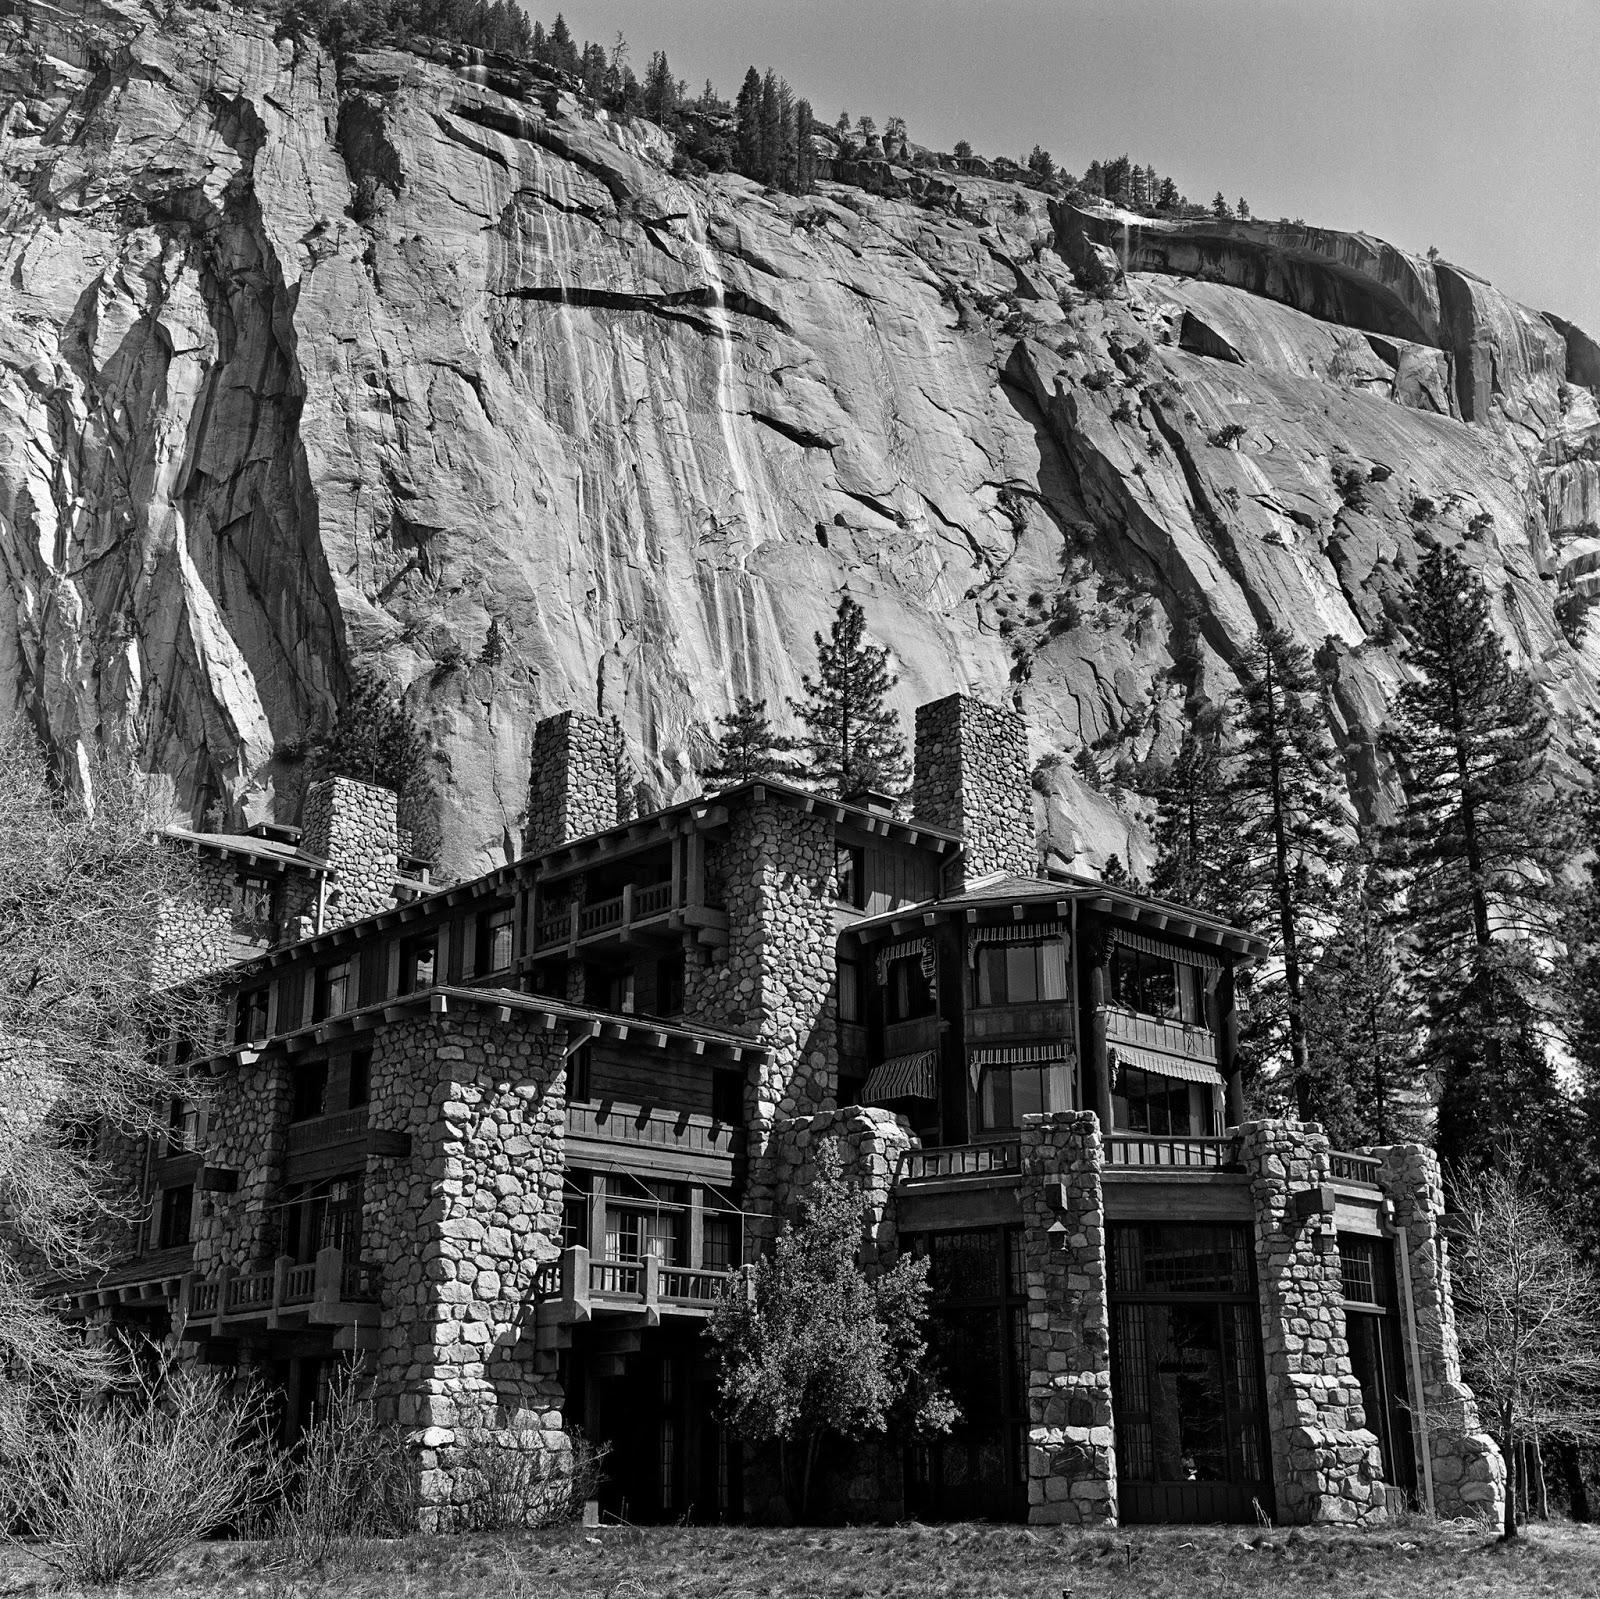 Ahwahnee Hotel Kitchen Yosemite California: Environment, Law, And History